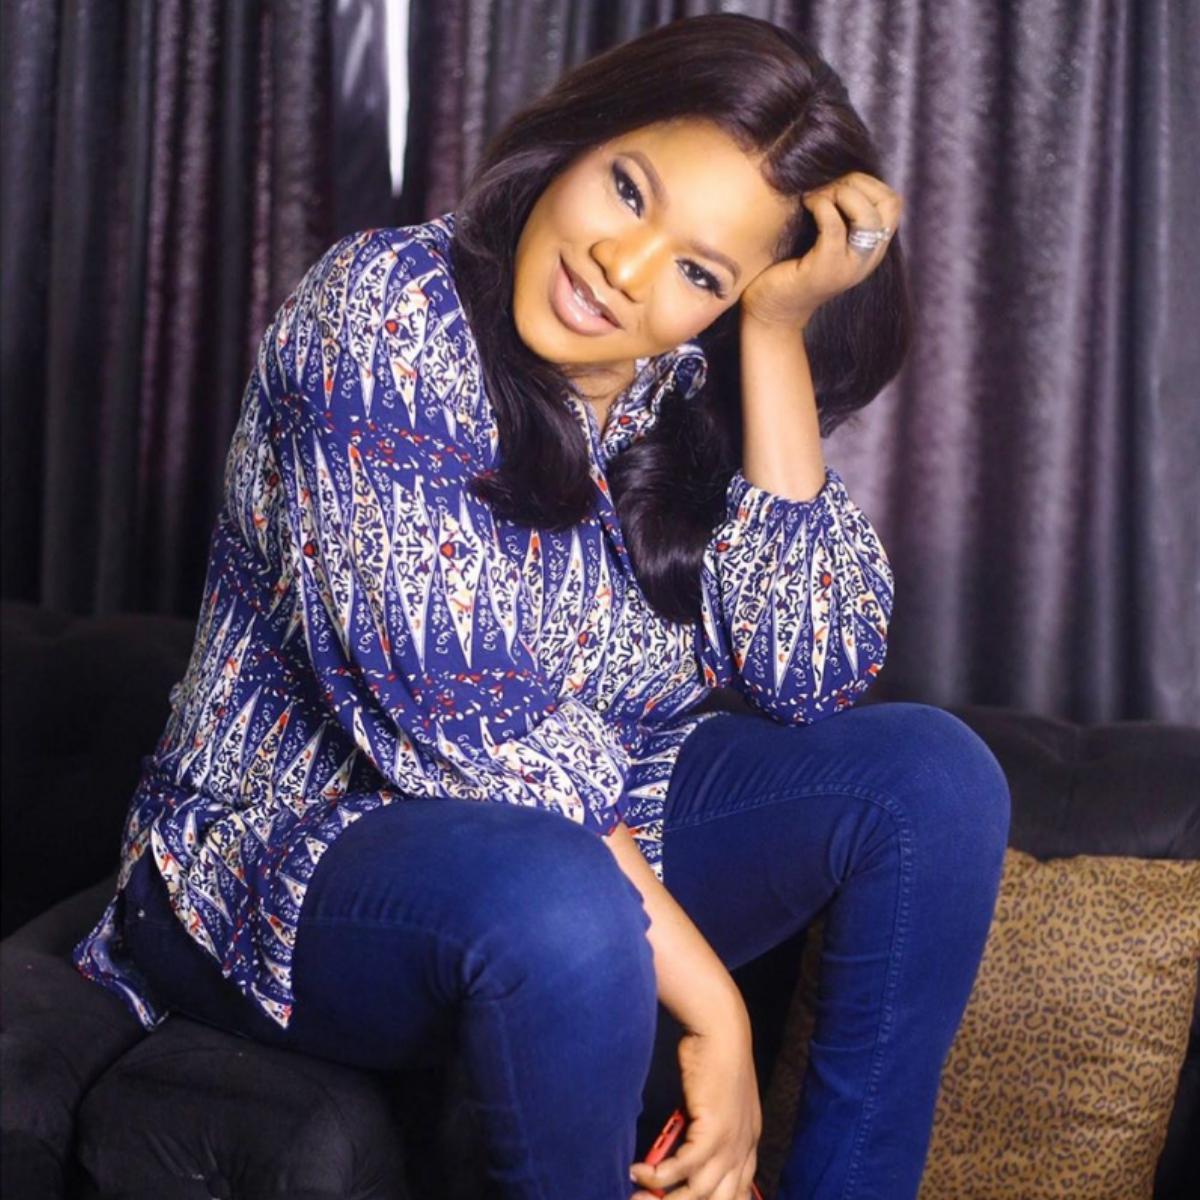 Toyin Lawani Tells Toyin Abraham She Was Ugly In Elevator Baby